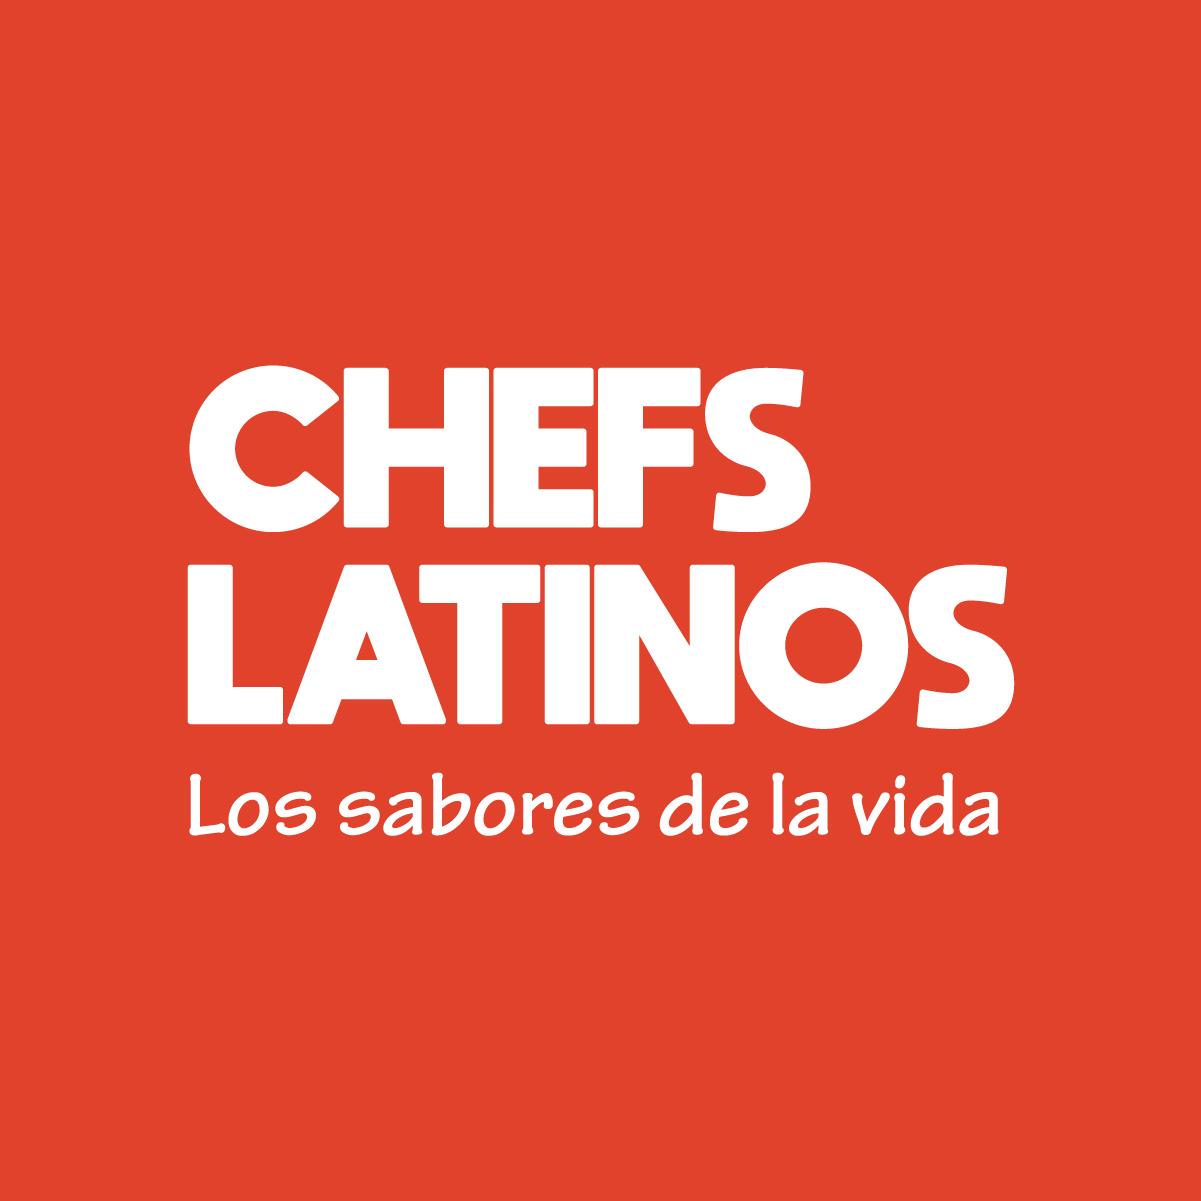 CHEFS Latinos